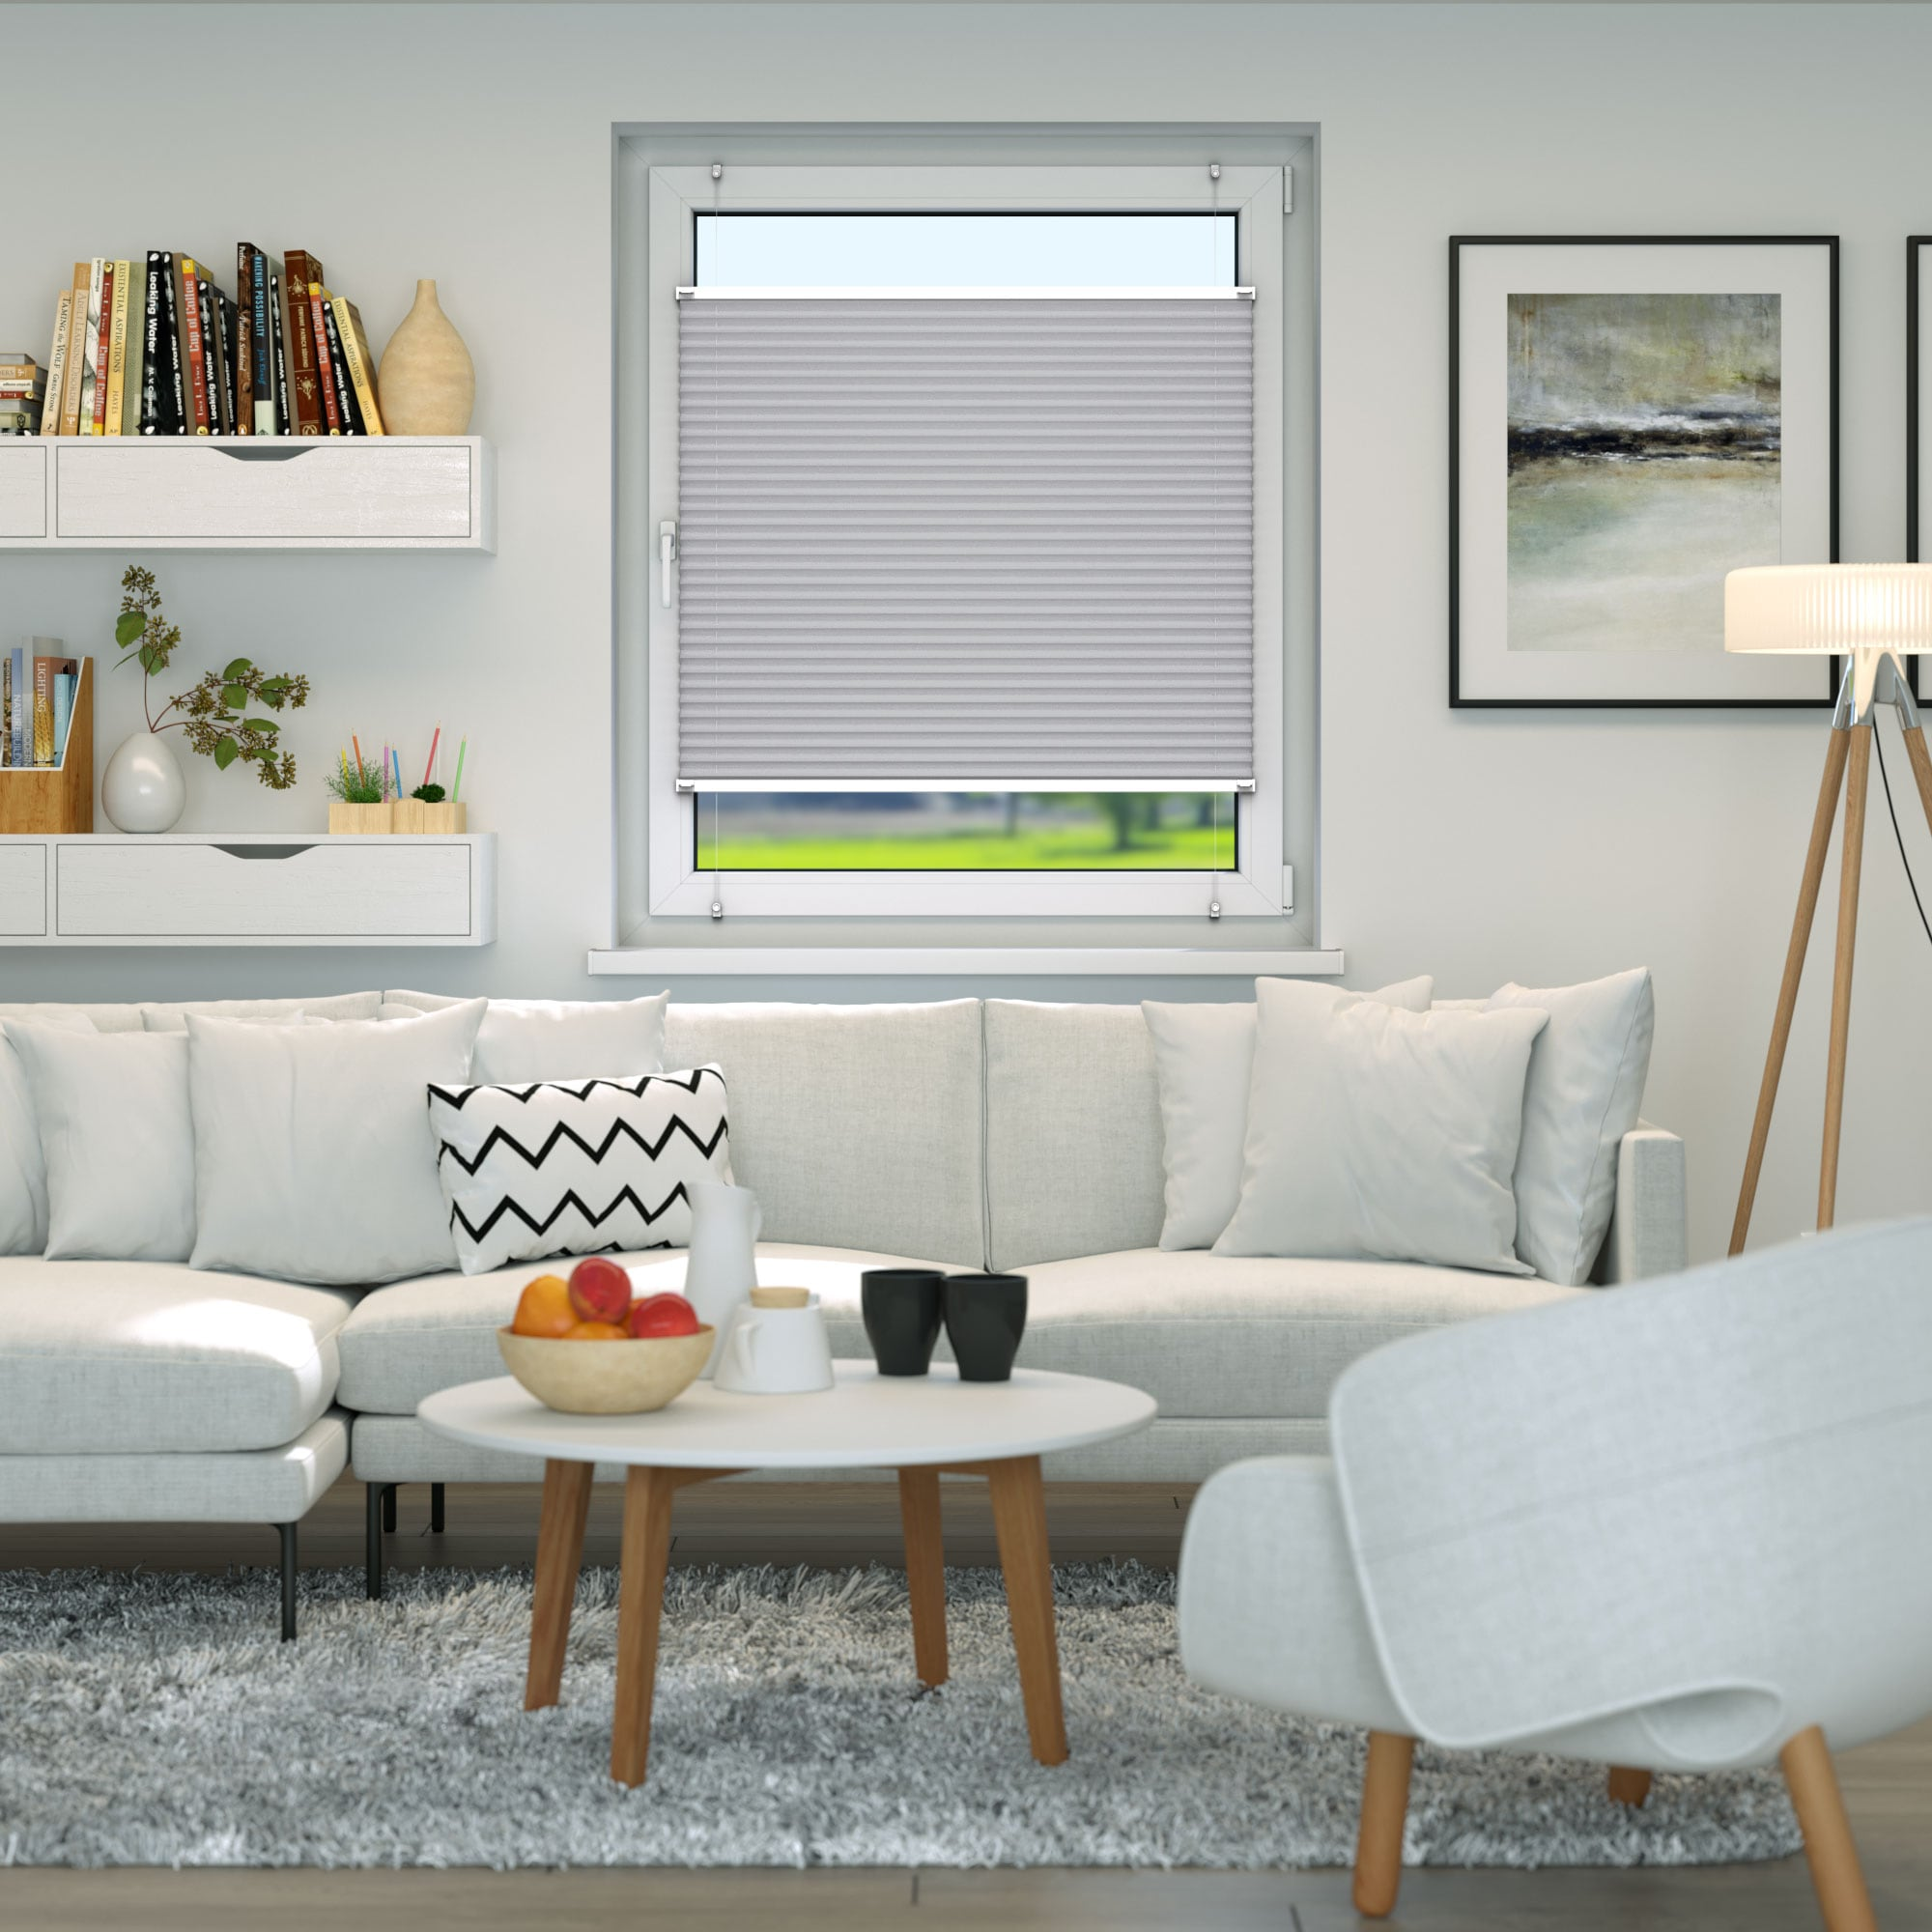 Klemmfix-Plissee-Faltrollo-ohne-Bohren-Fenster-Tuer-Plisseerollo-Plisee-Easyfix Indexbild 17